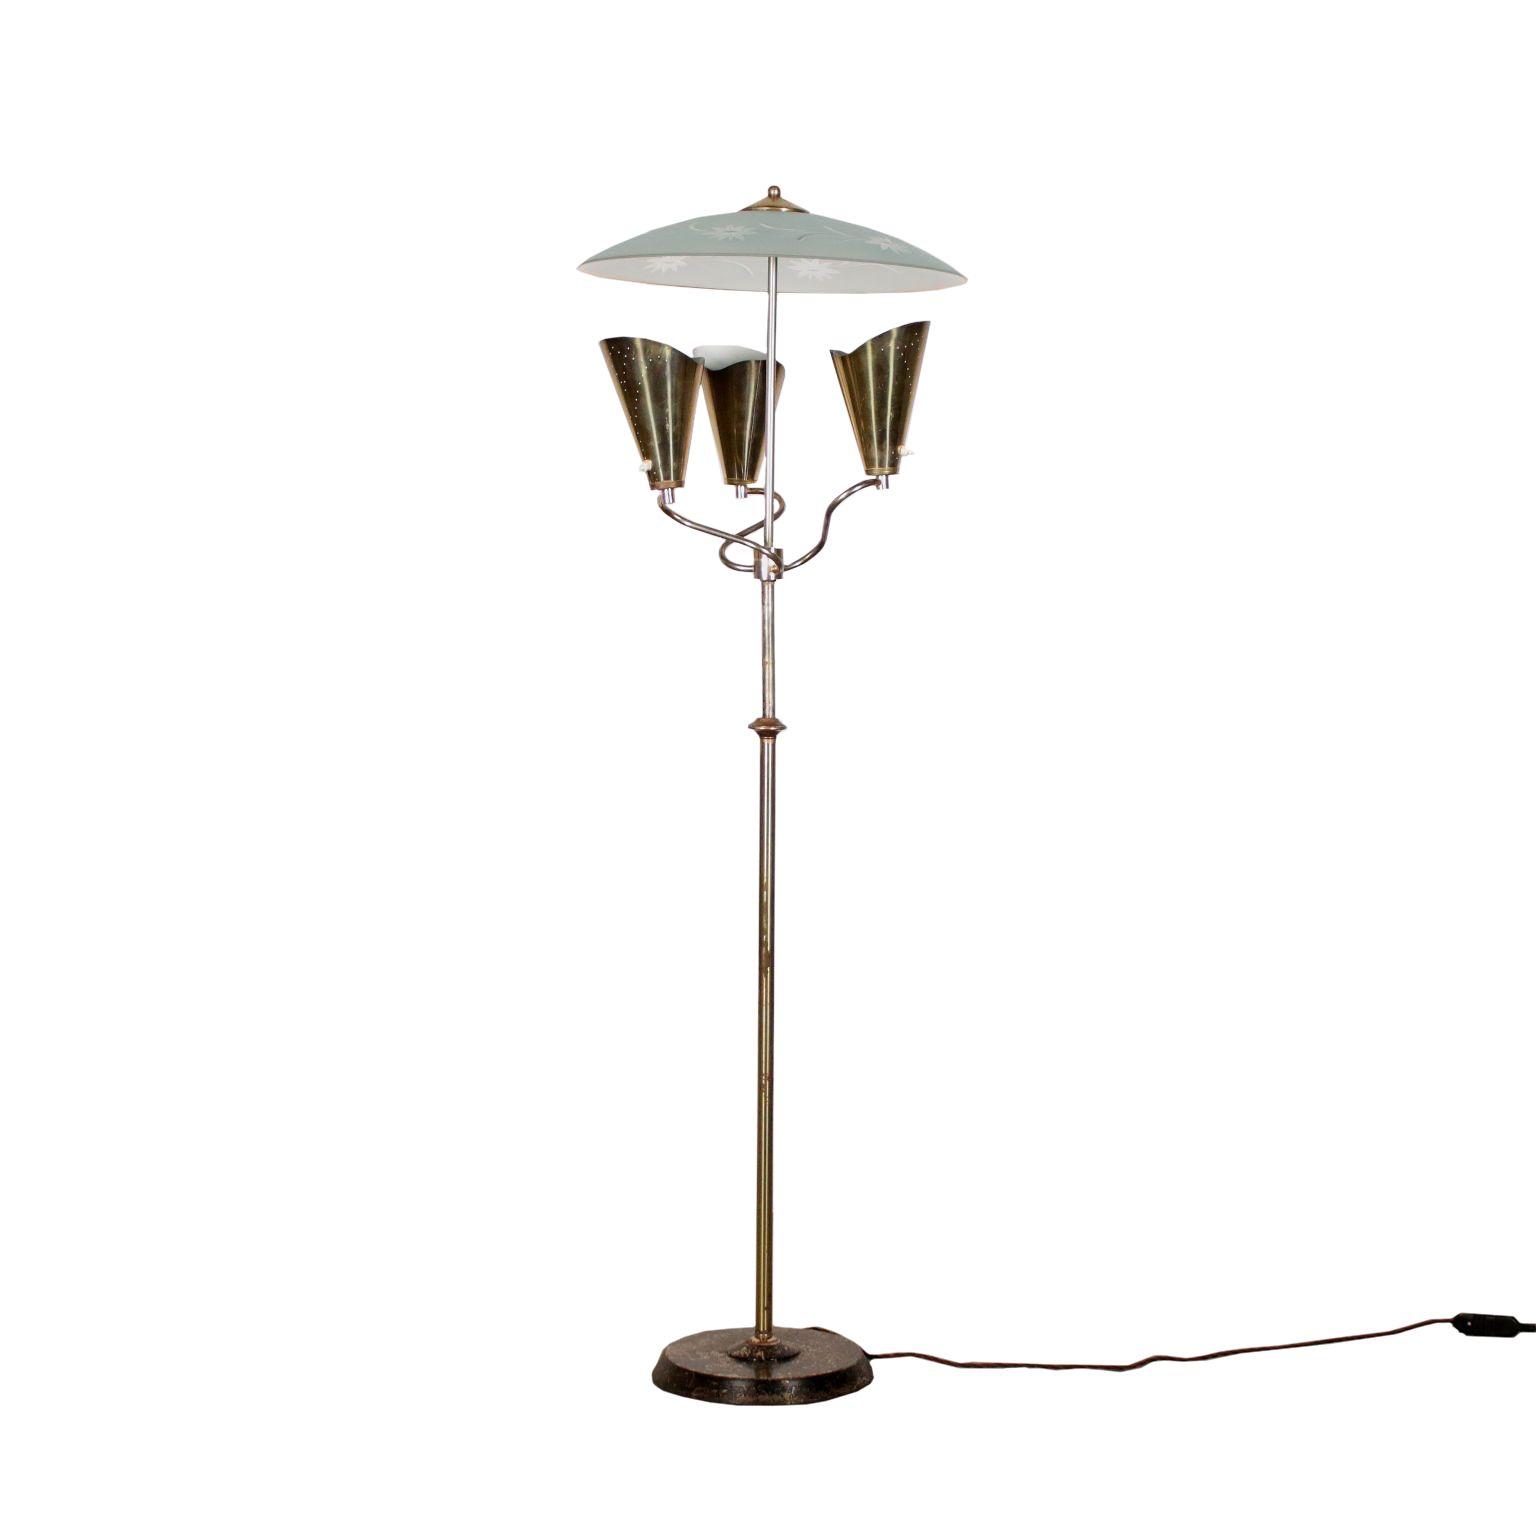 Floor Lamp Chromed Metal Glass Vintage Italy 1960s Floor Lamp